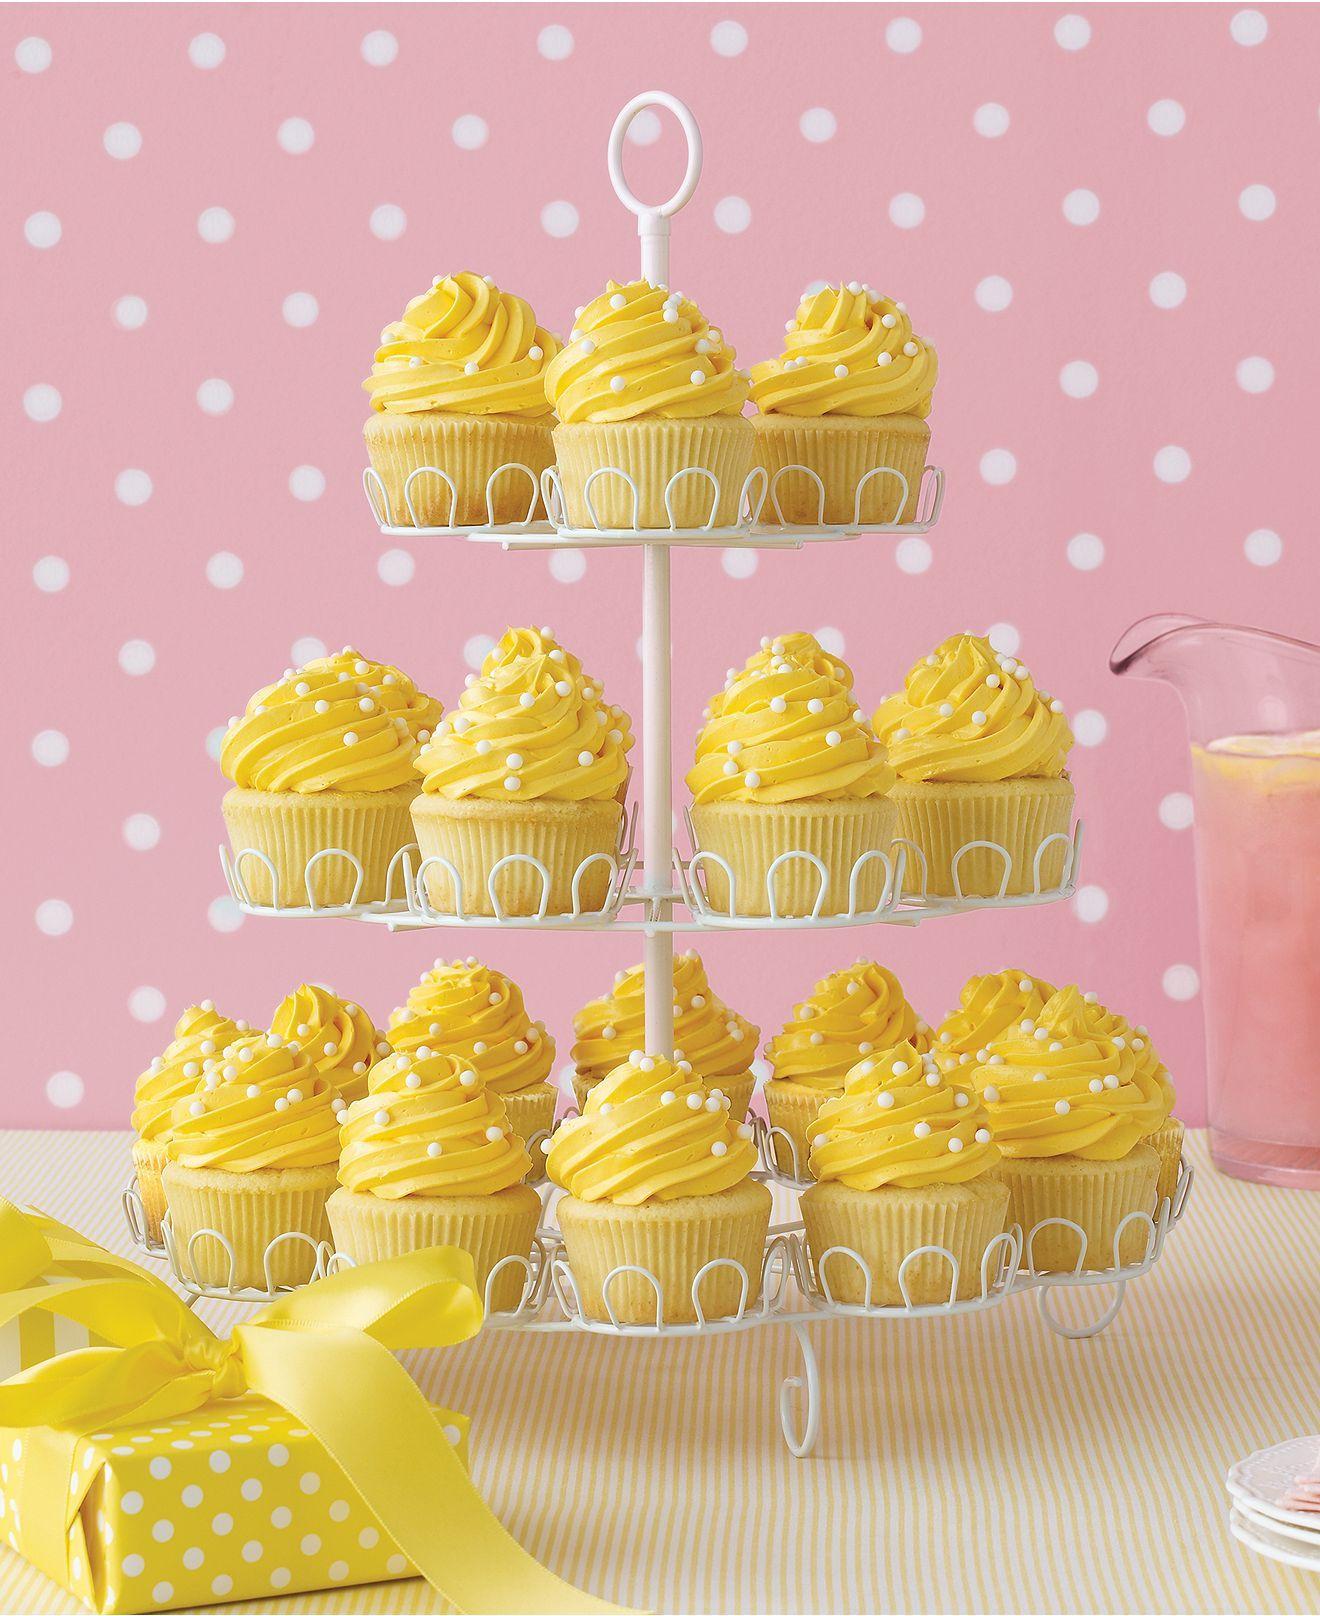 martha stewart collection cupcake tree utensils utensil sets